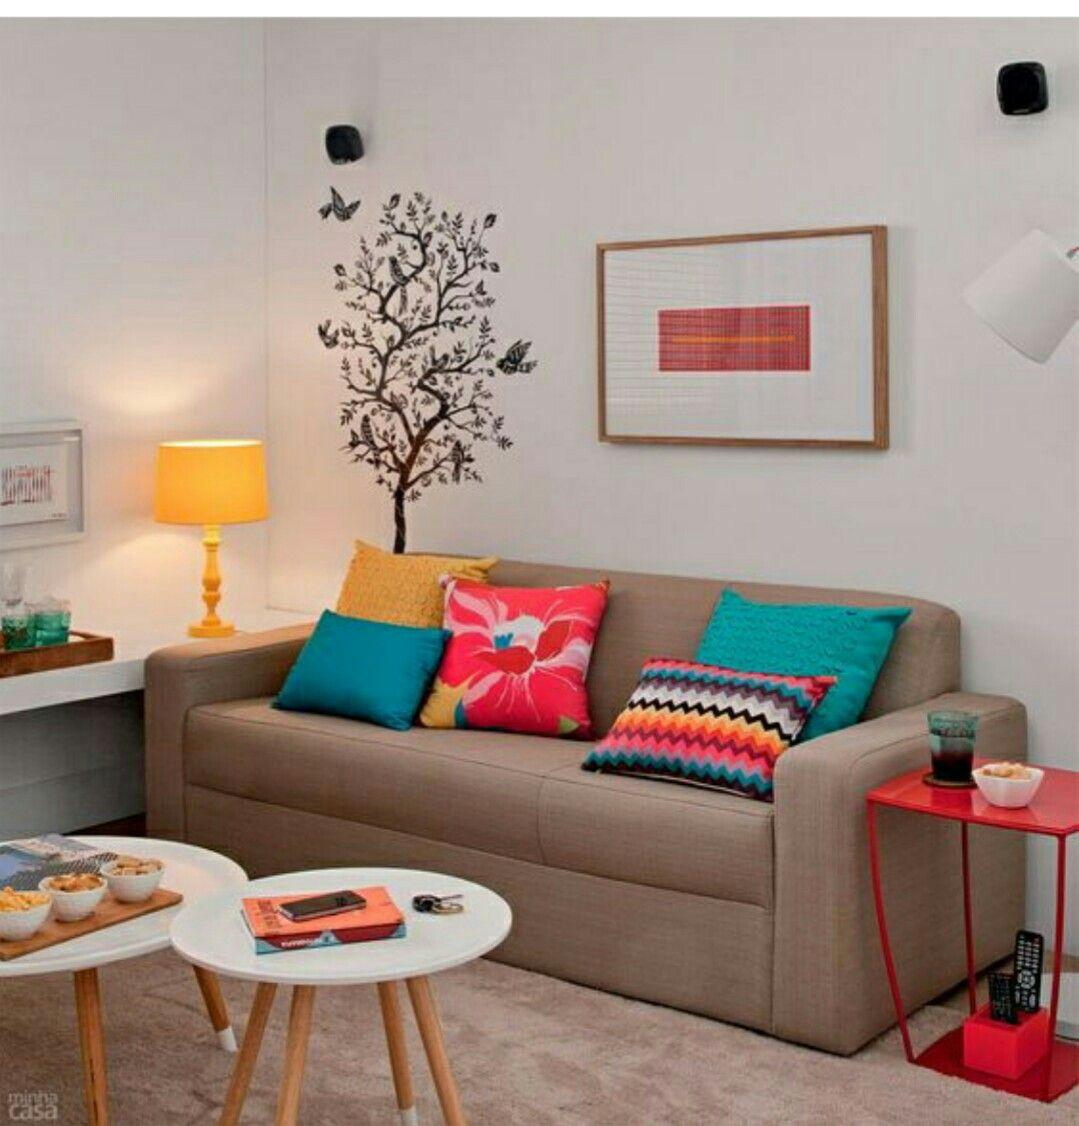 Pin Do A Louise N D Em Meubles Pinterest Decora O Casa  -> Sala Pequena Simples E Barata